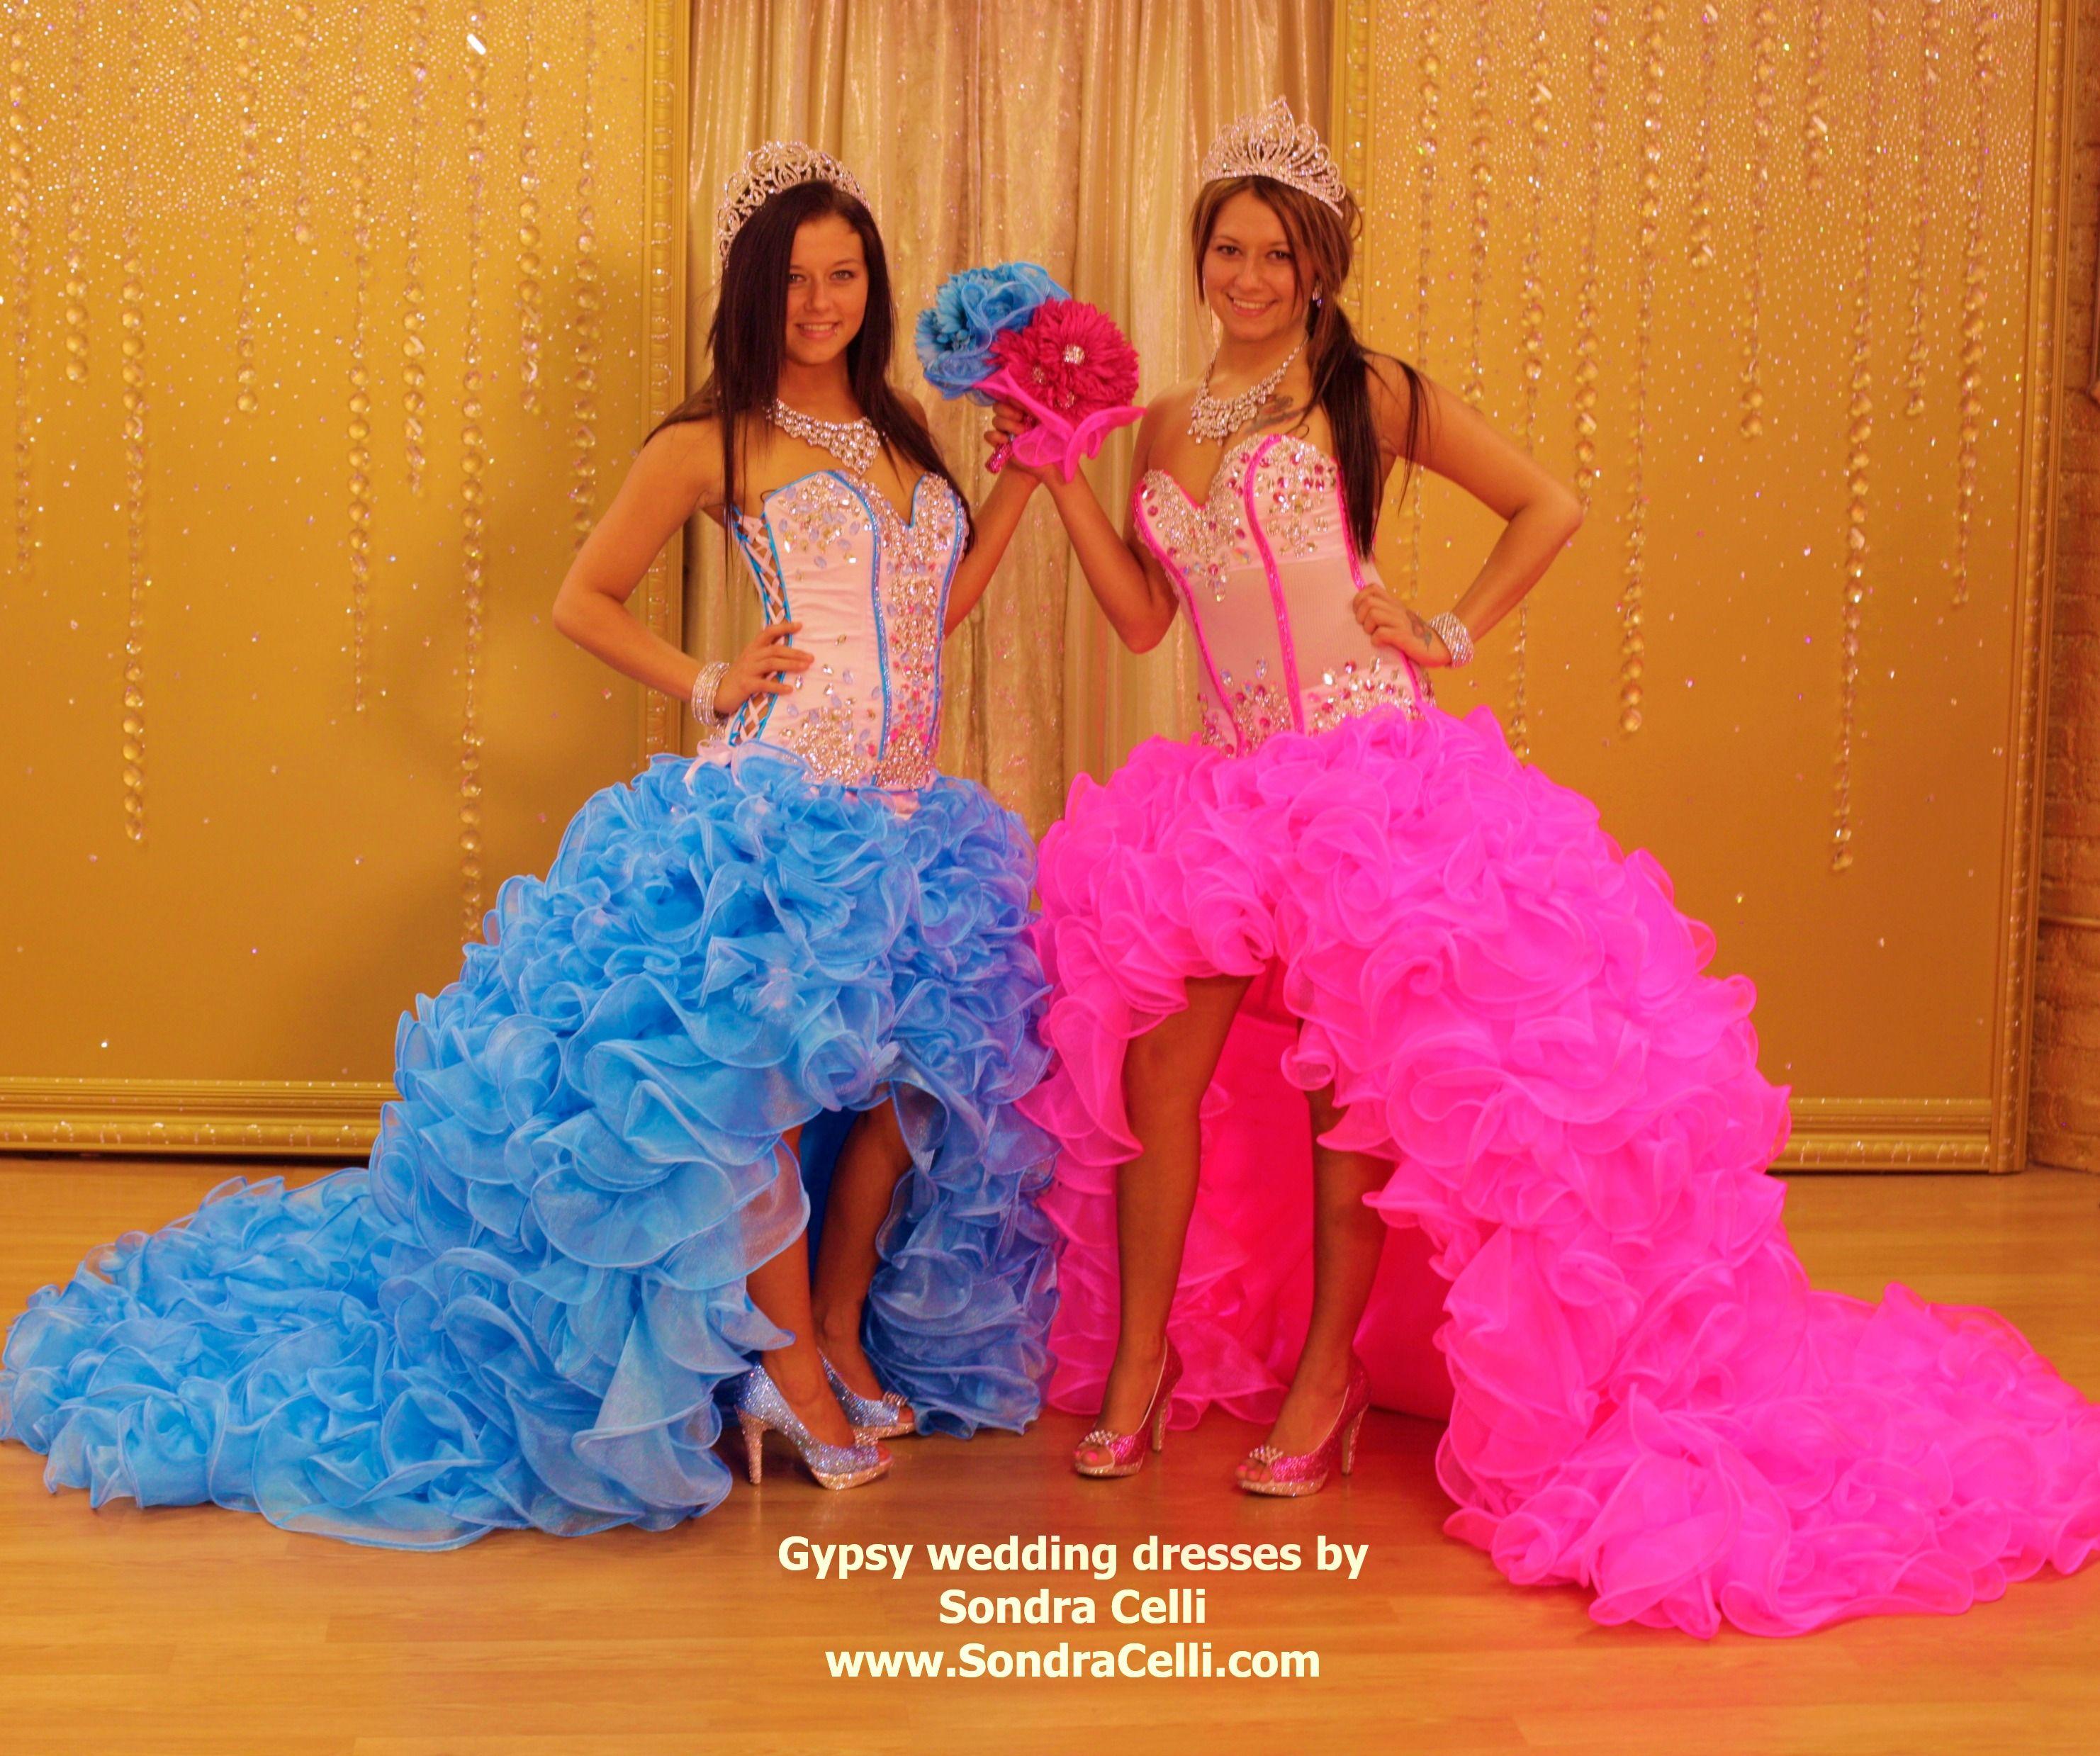 American Gypsy Wedding: High/low Ruffled Skirts Of Crystal Organza With Blinged